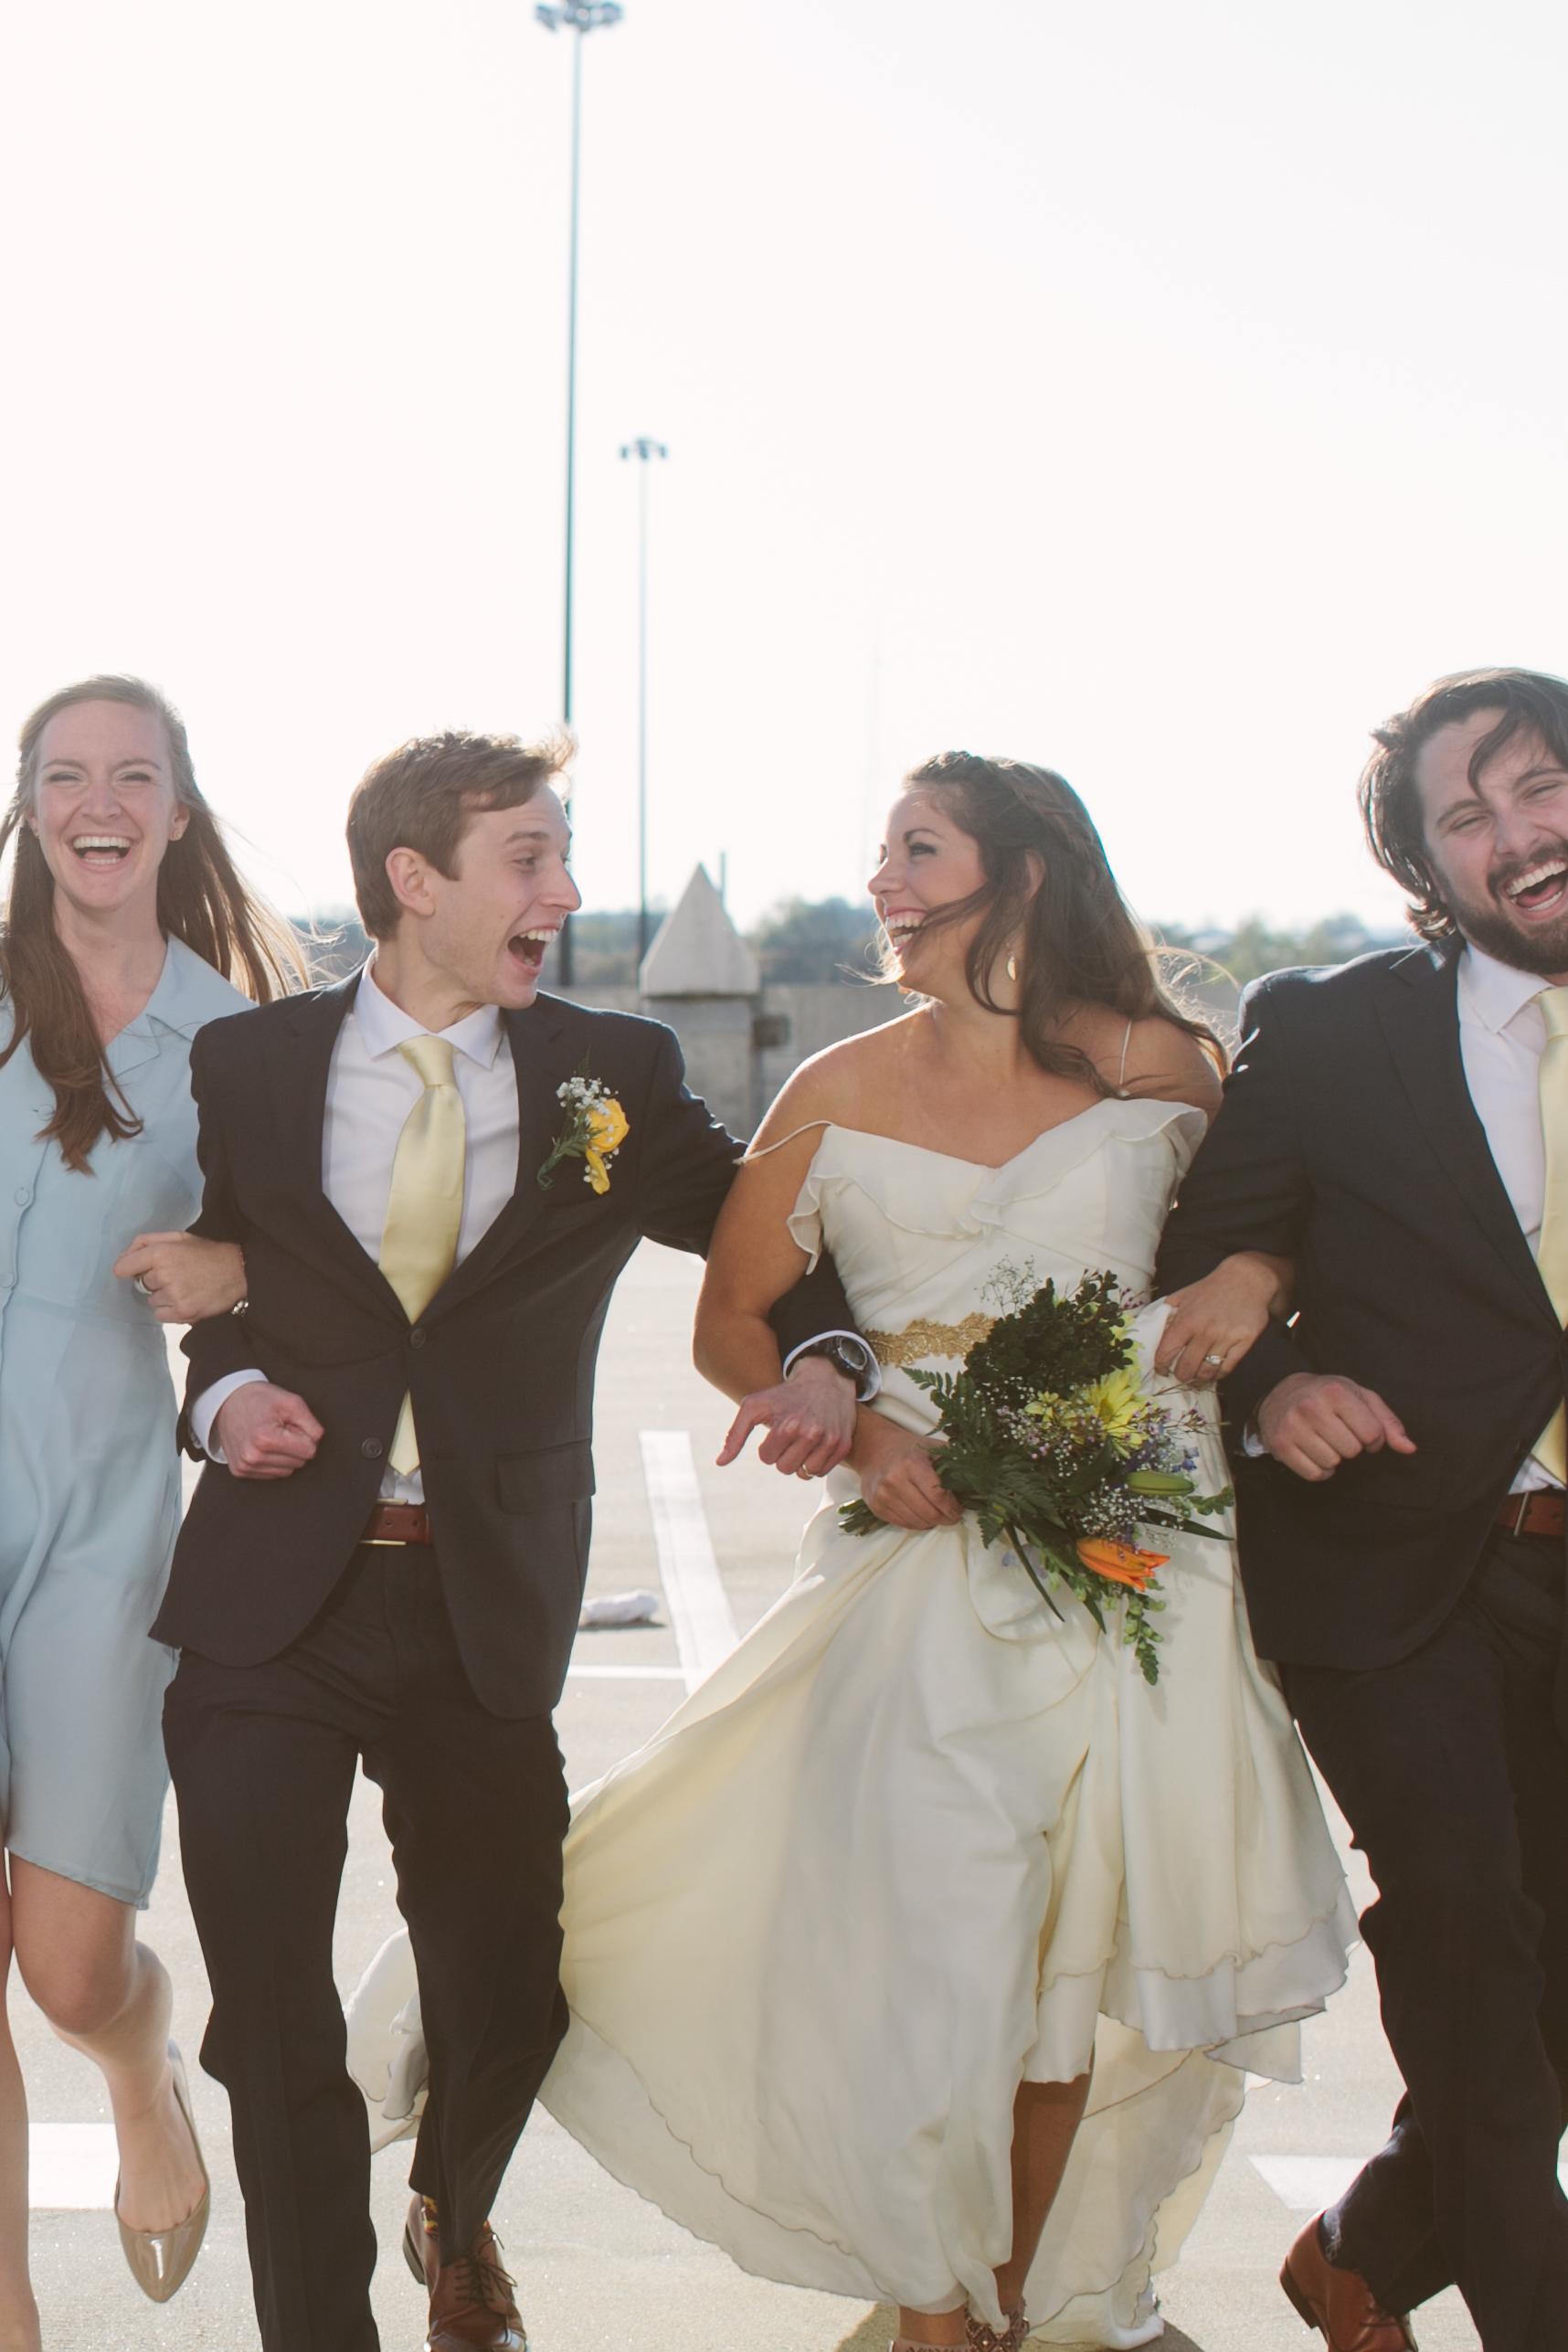 Kathryn-McCrary-Photography-Atlanta-Wedding-Photographer-33.jpg